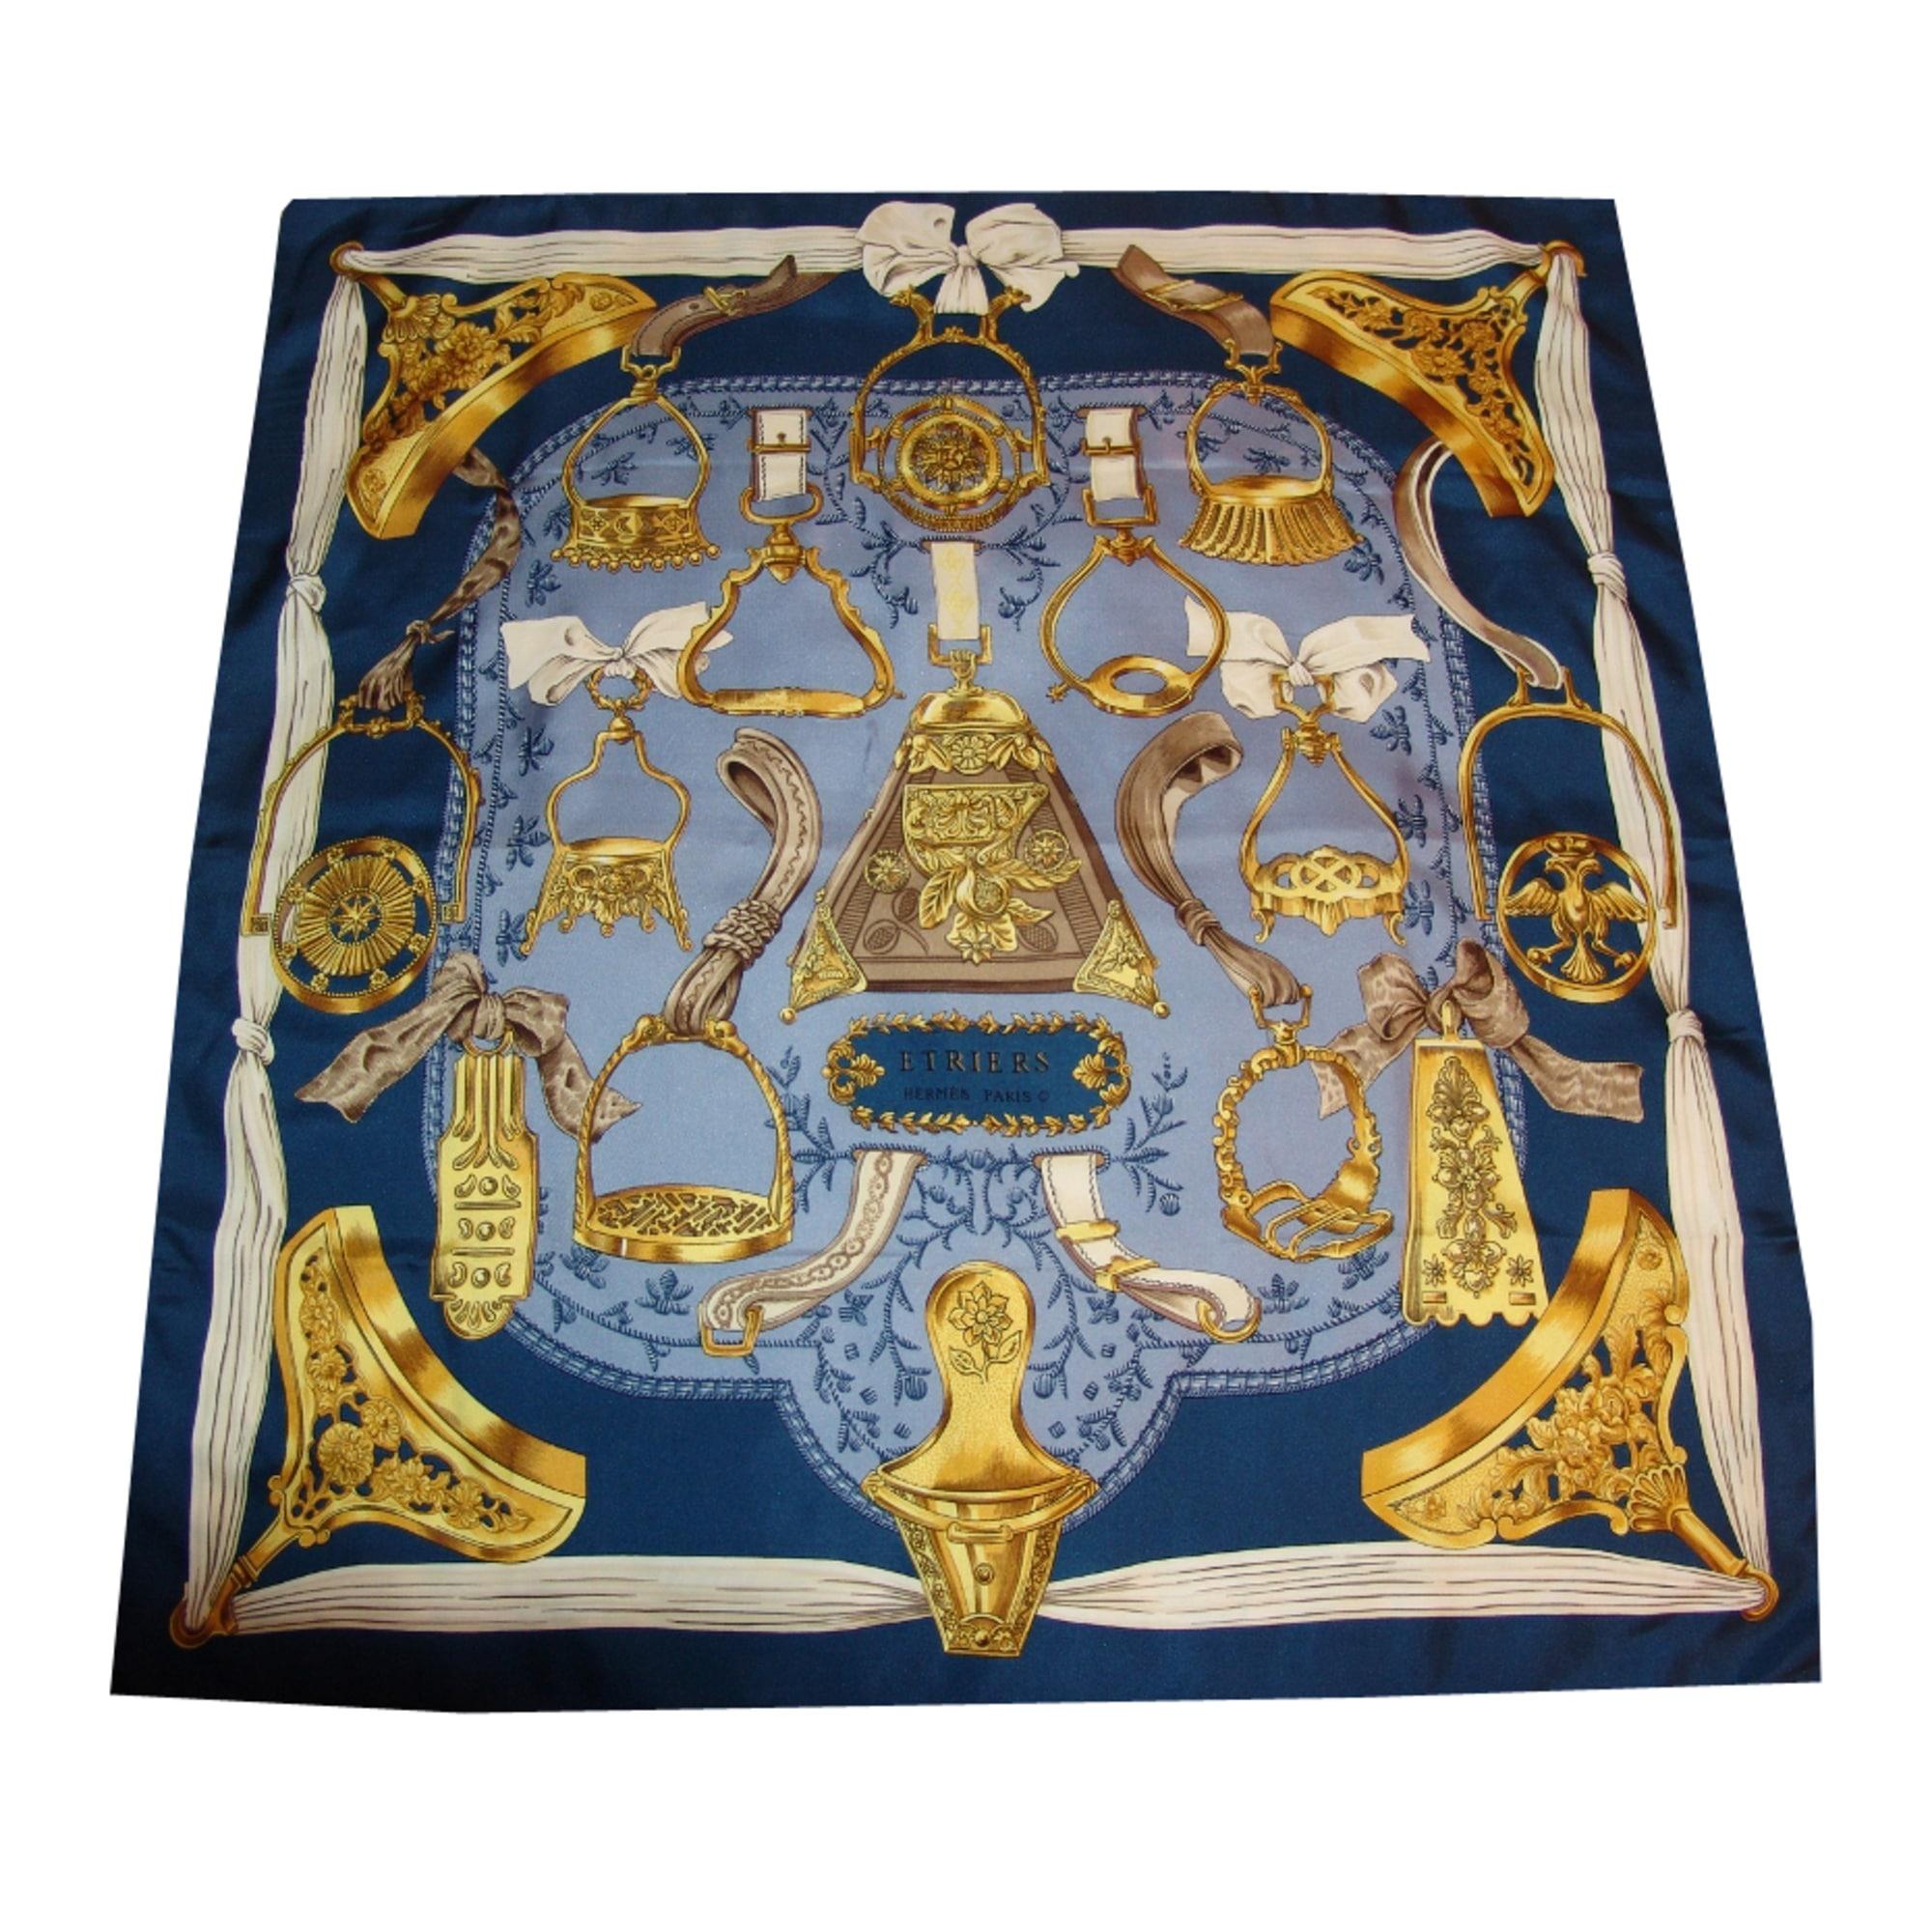 Foulard HERMÈS bleu marine vendu par D annabelle 5135064 - 1155598 30333c5e19e